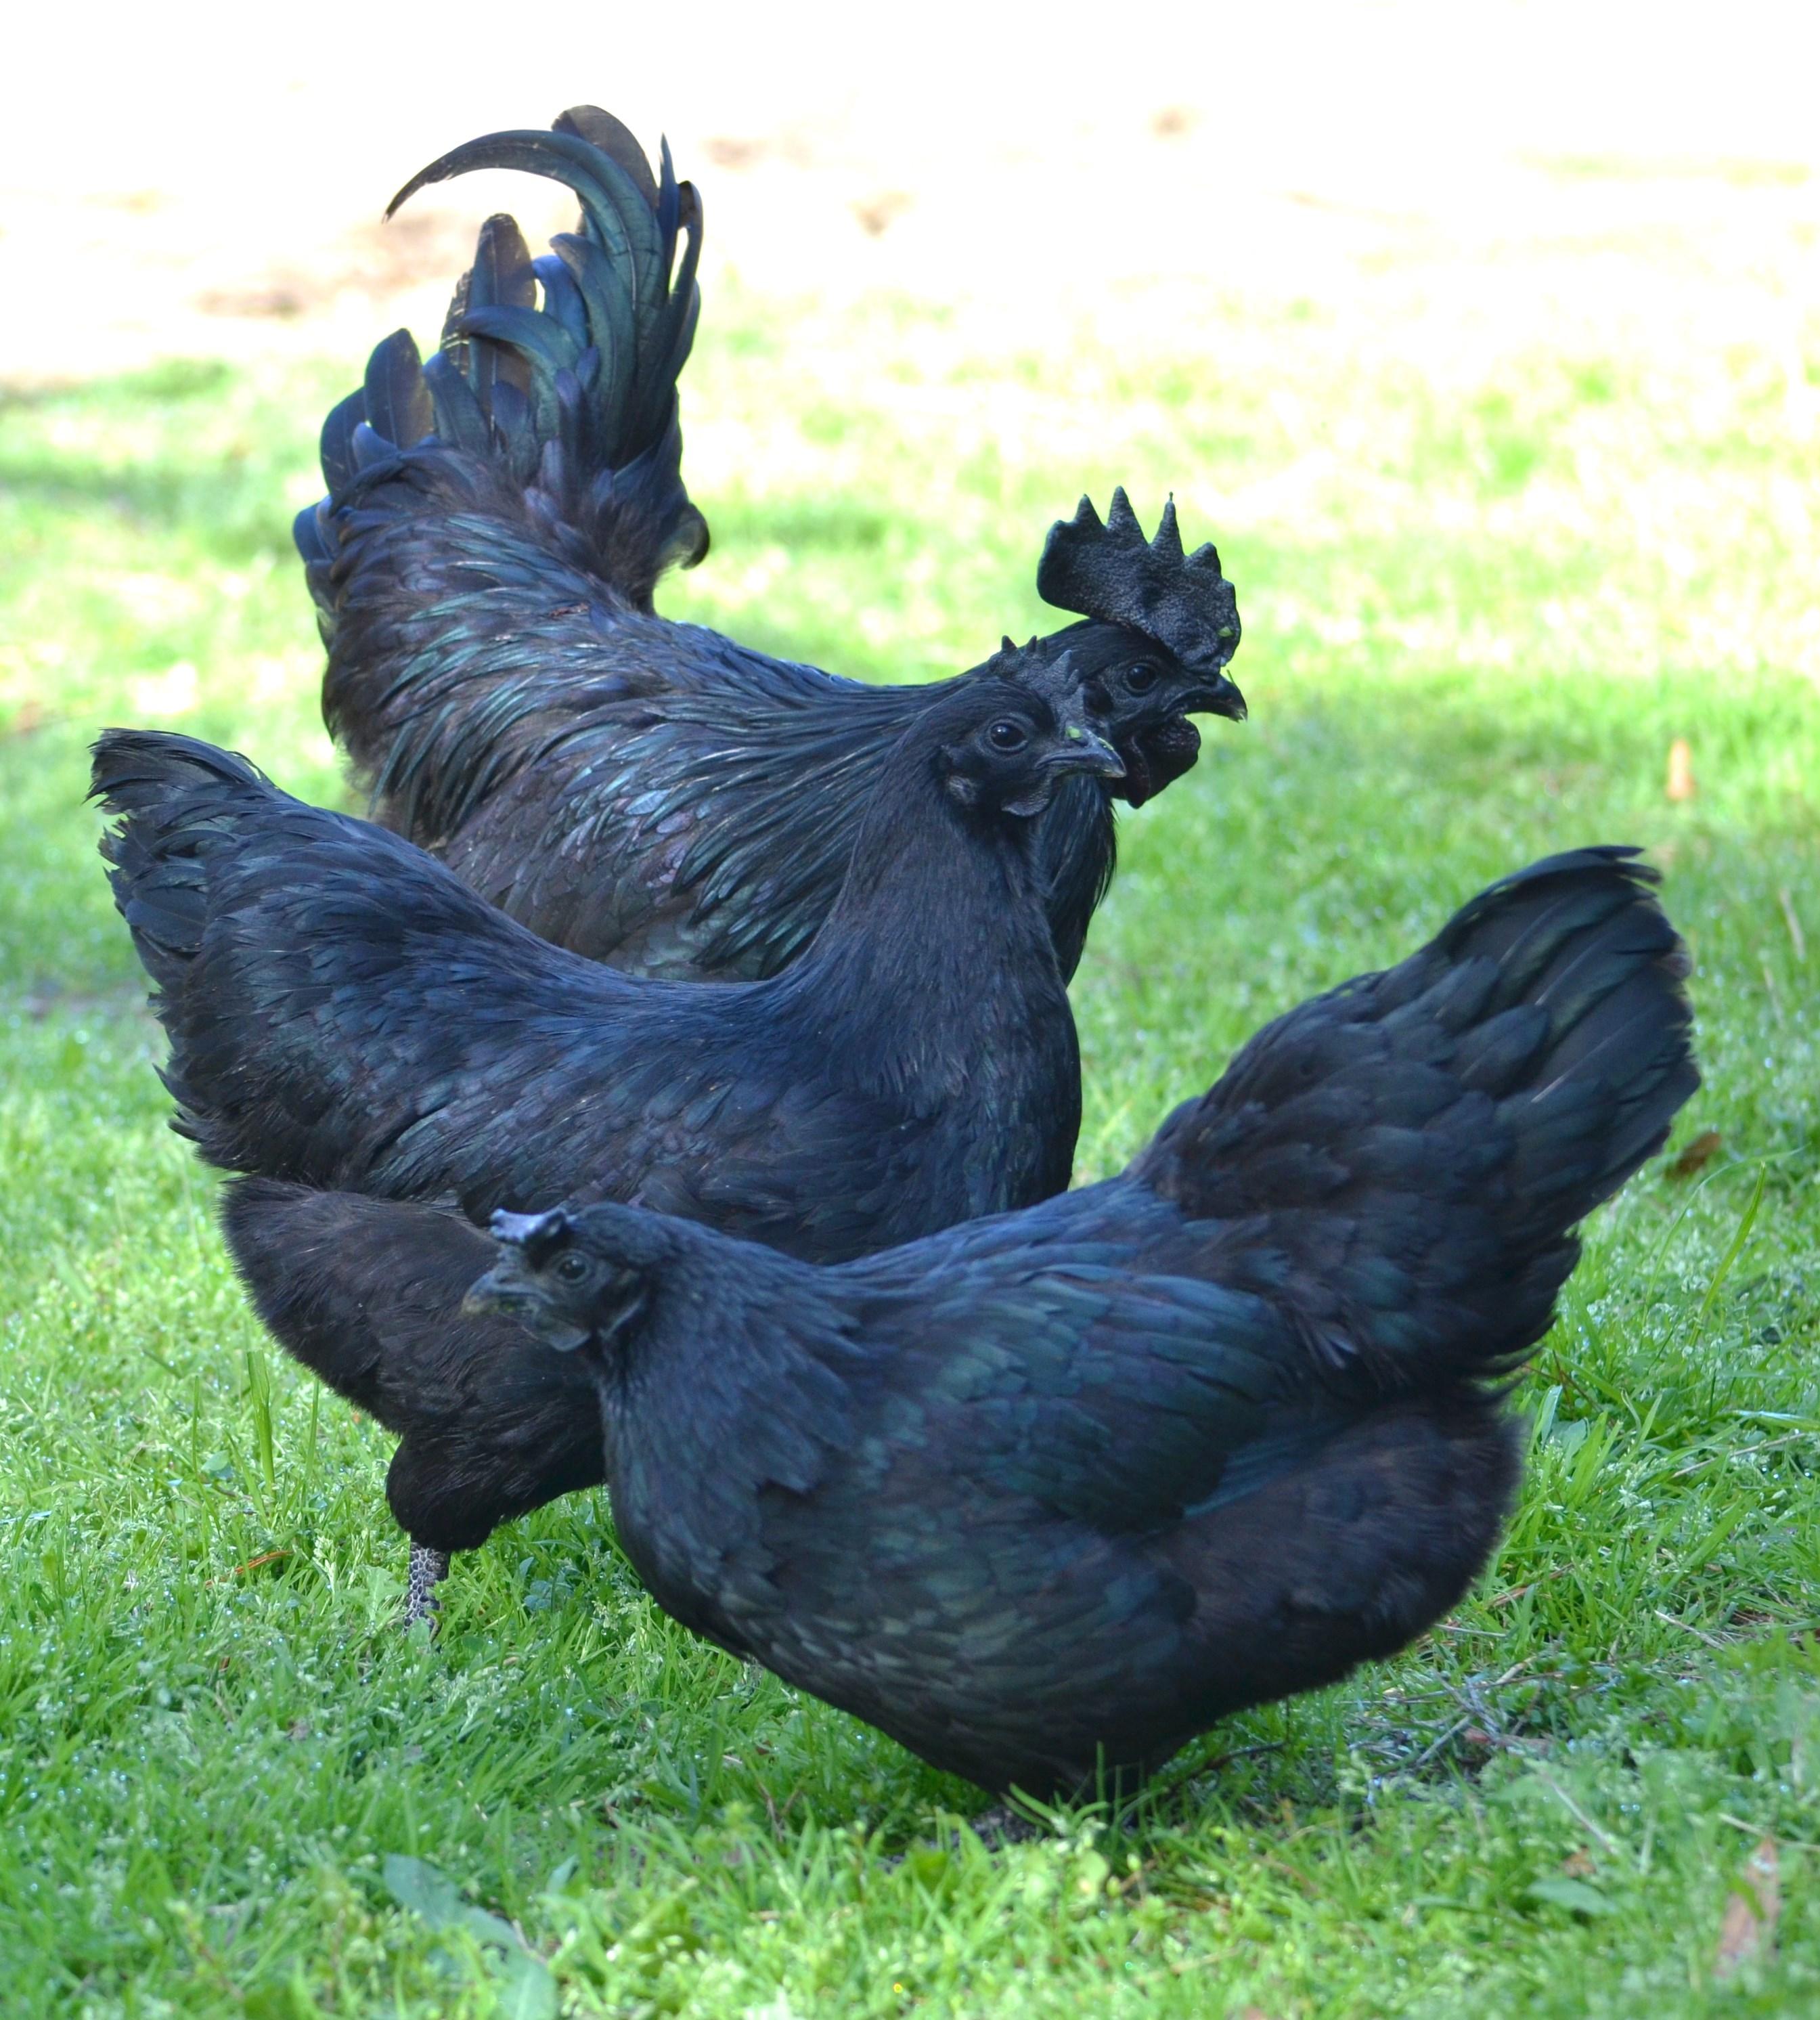 Ayam Cemani chickens